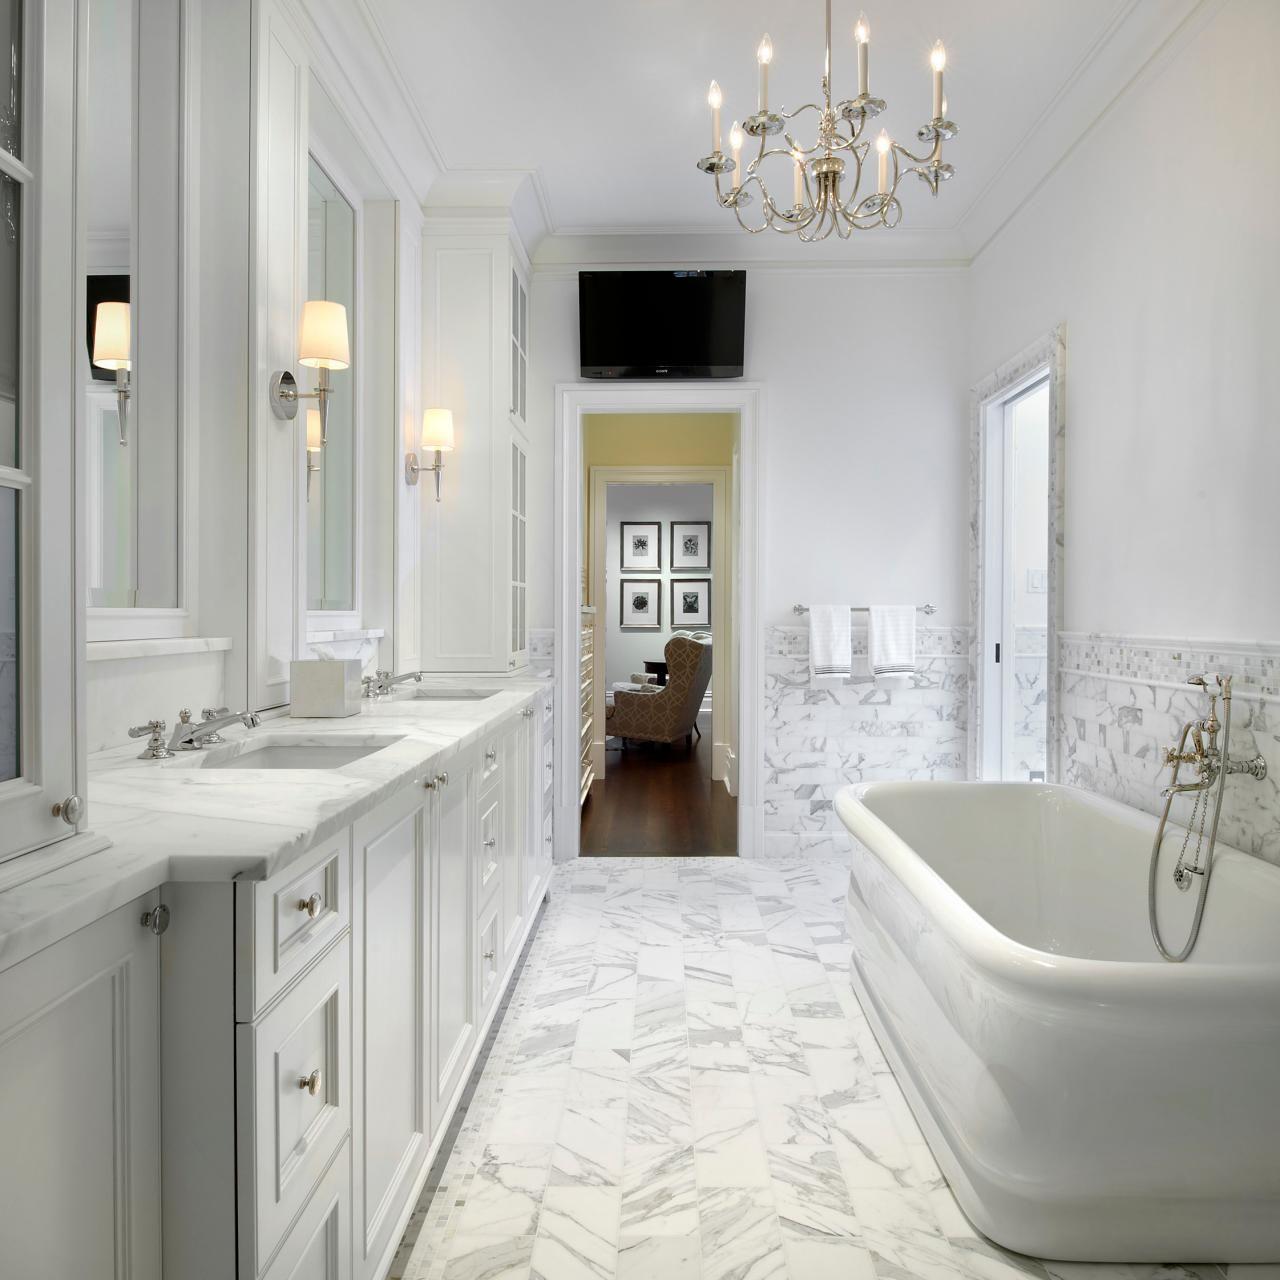 ferris rafauli - Google Search | Bathrooms | Pinterest | Bathroom ...